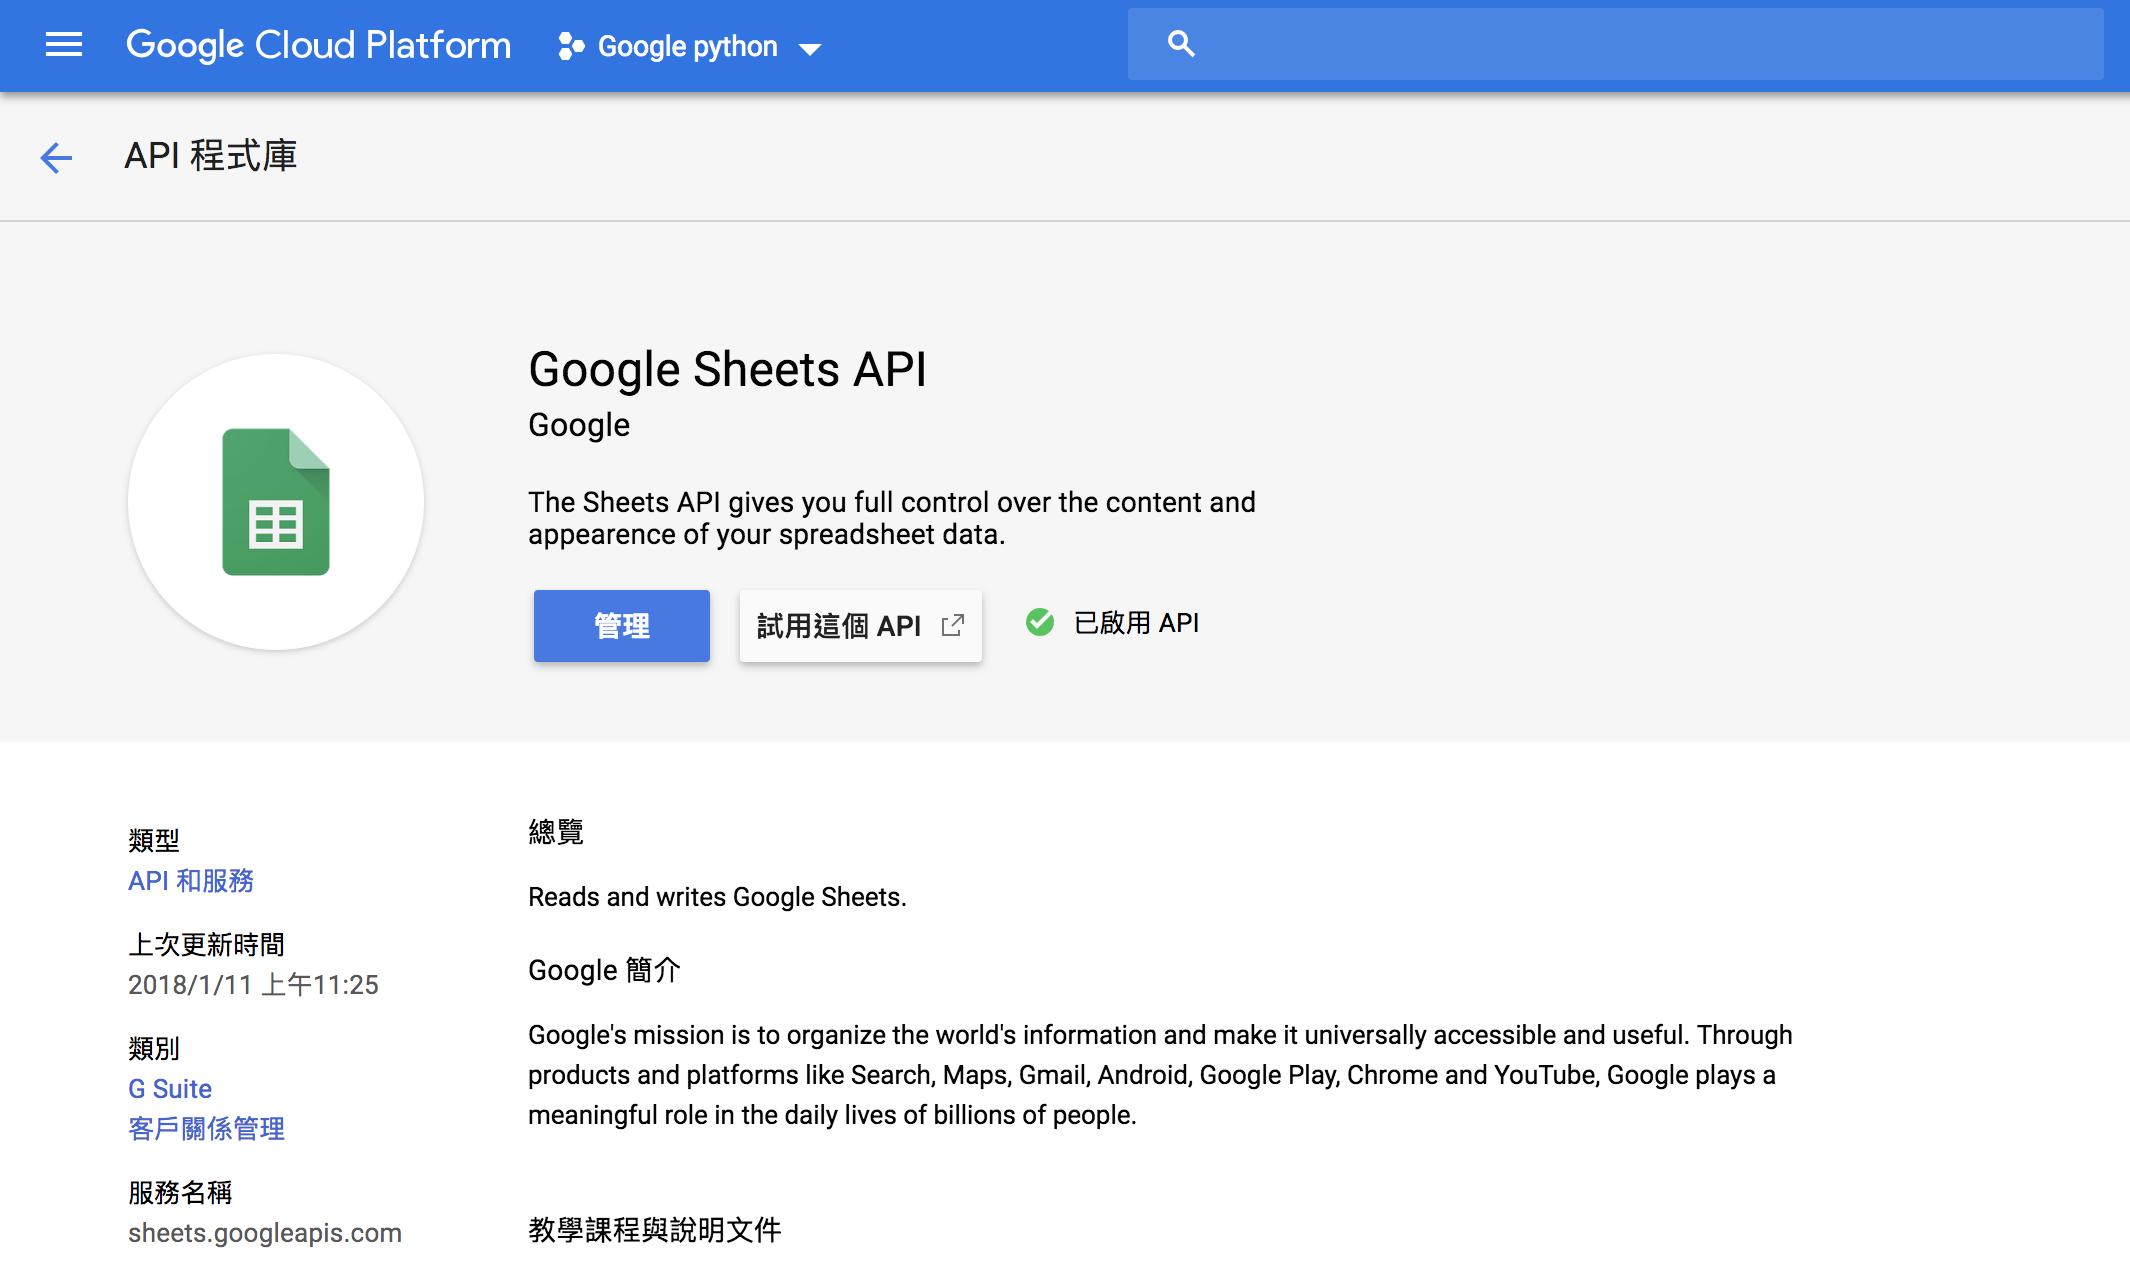 GoogleSheet_API